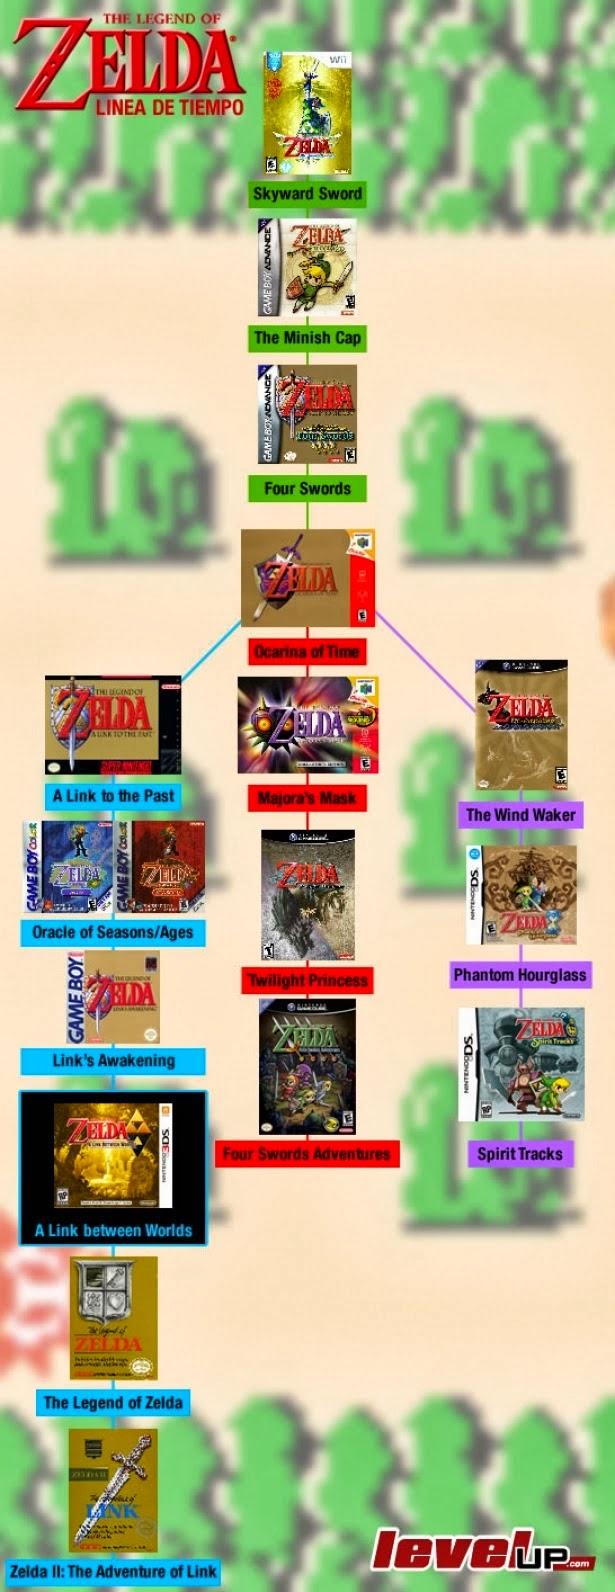 The Legend of Zelda Cronología 2014